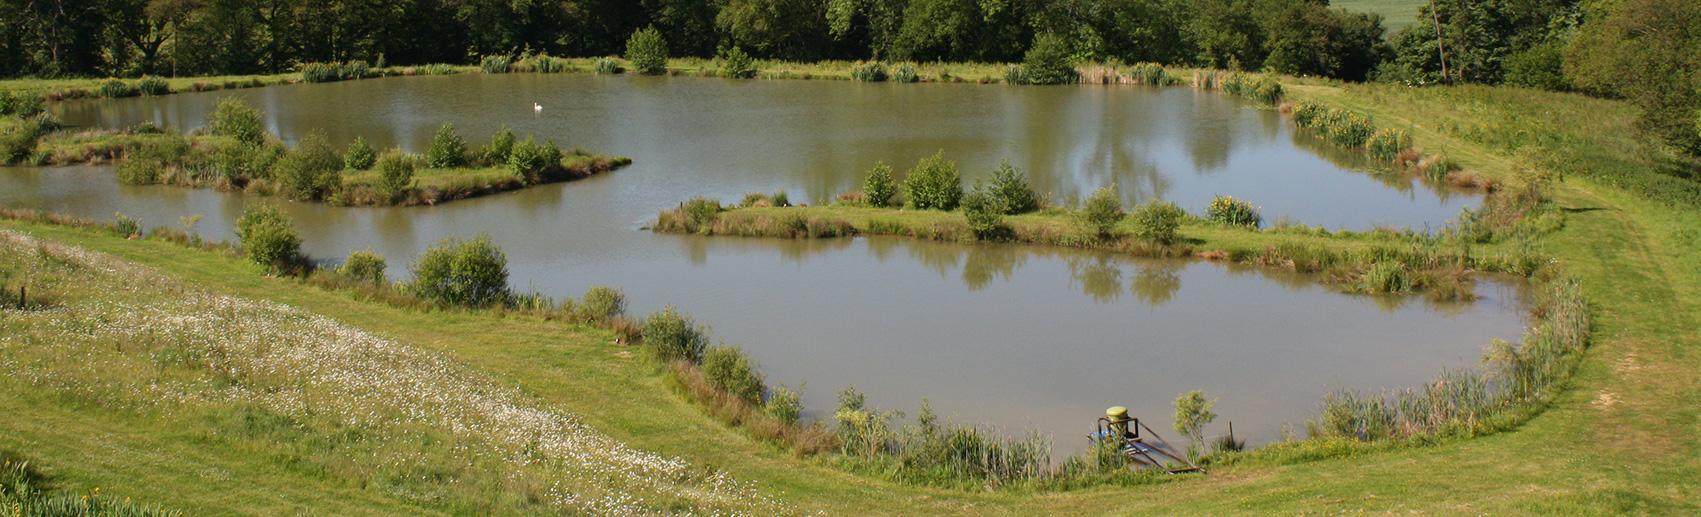 jennys fishing lake - newdigate farms estate